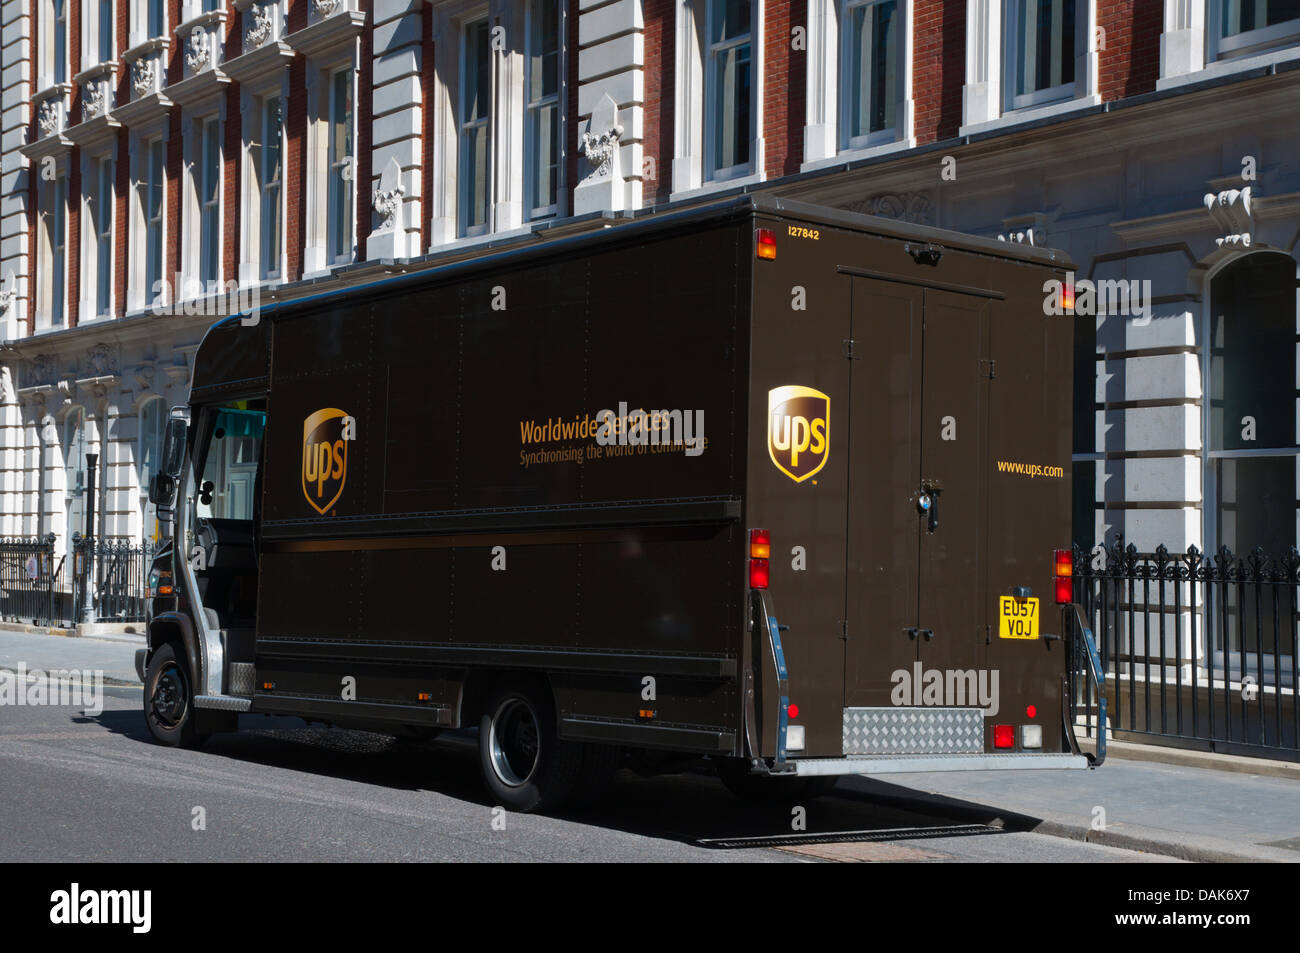 UPS Lieferung Post Parcel Service Fahrzeug Fitzrovia Bezirk central London England Großbritannien UK Europe Stockbild